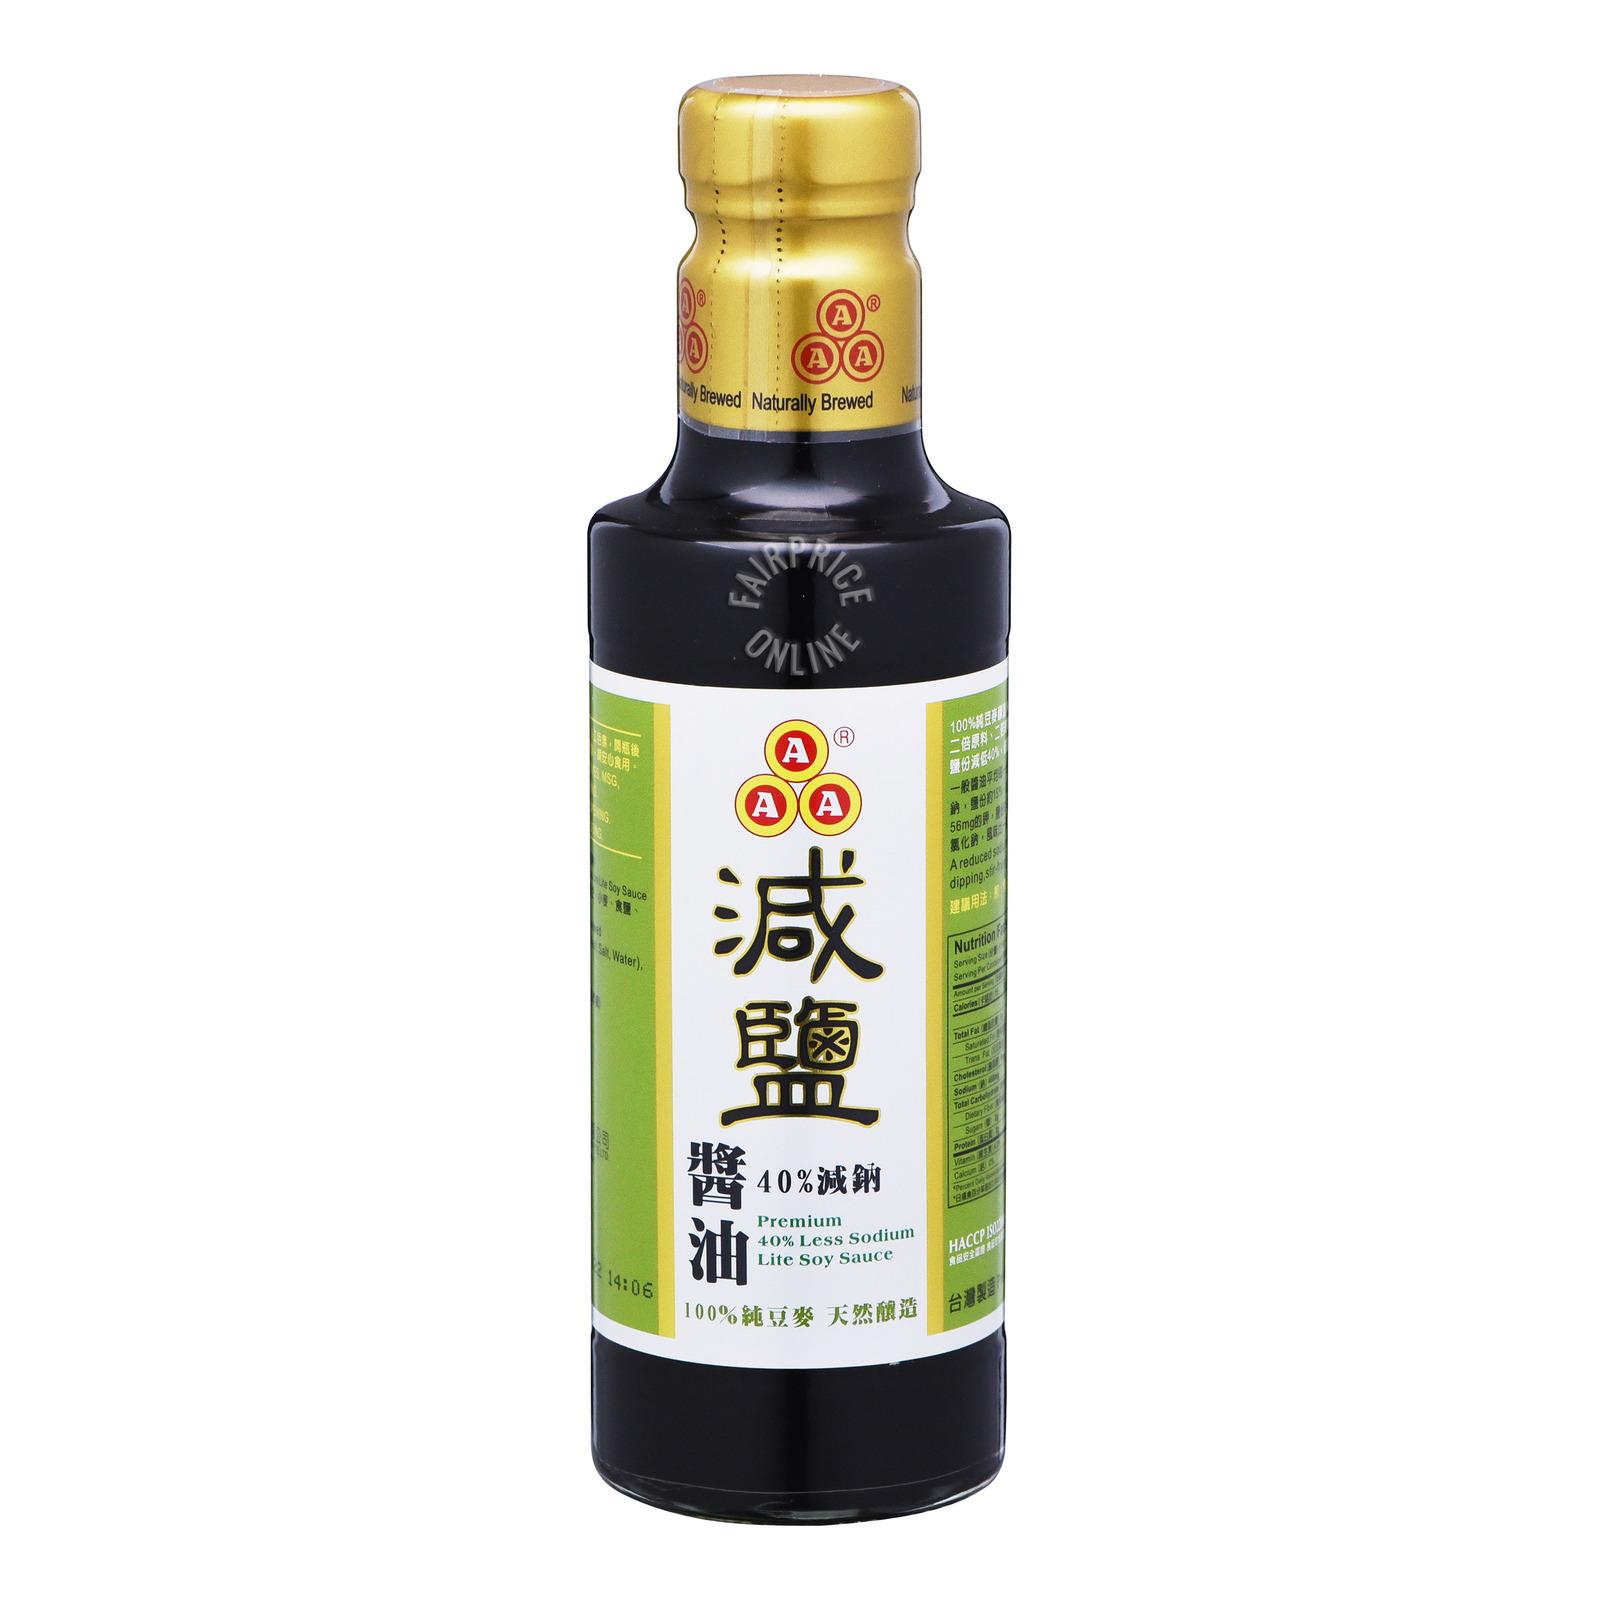 AAA Premium Soy Sauce - 40% Less Sodium Lite